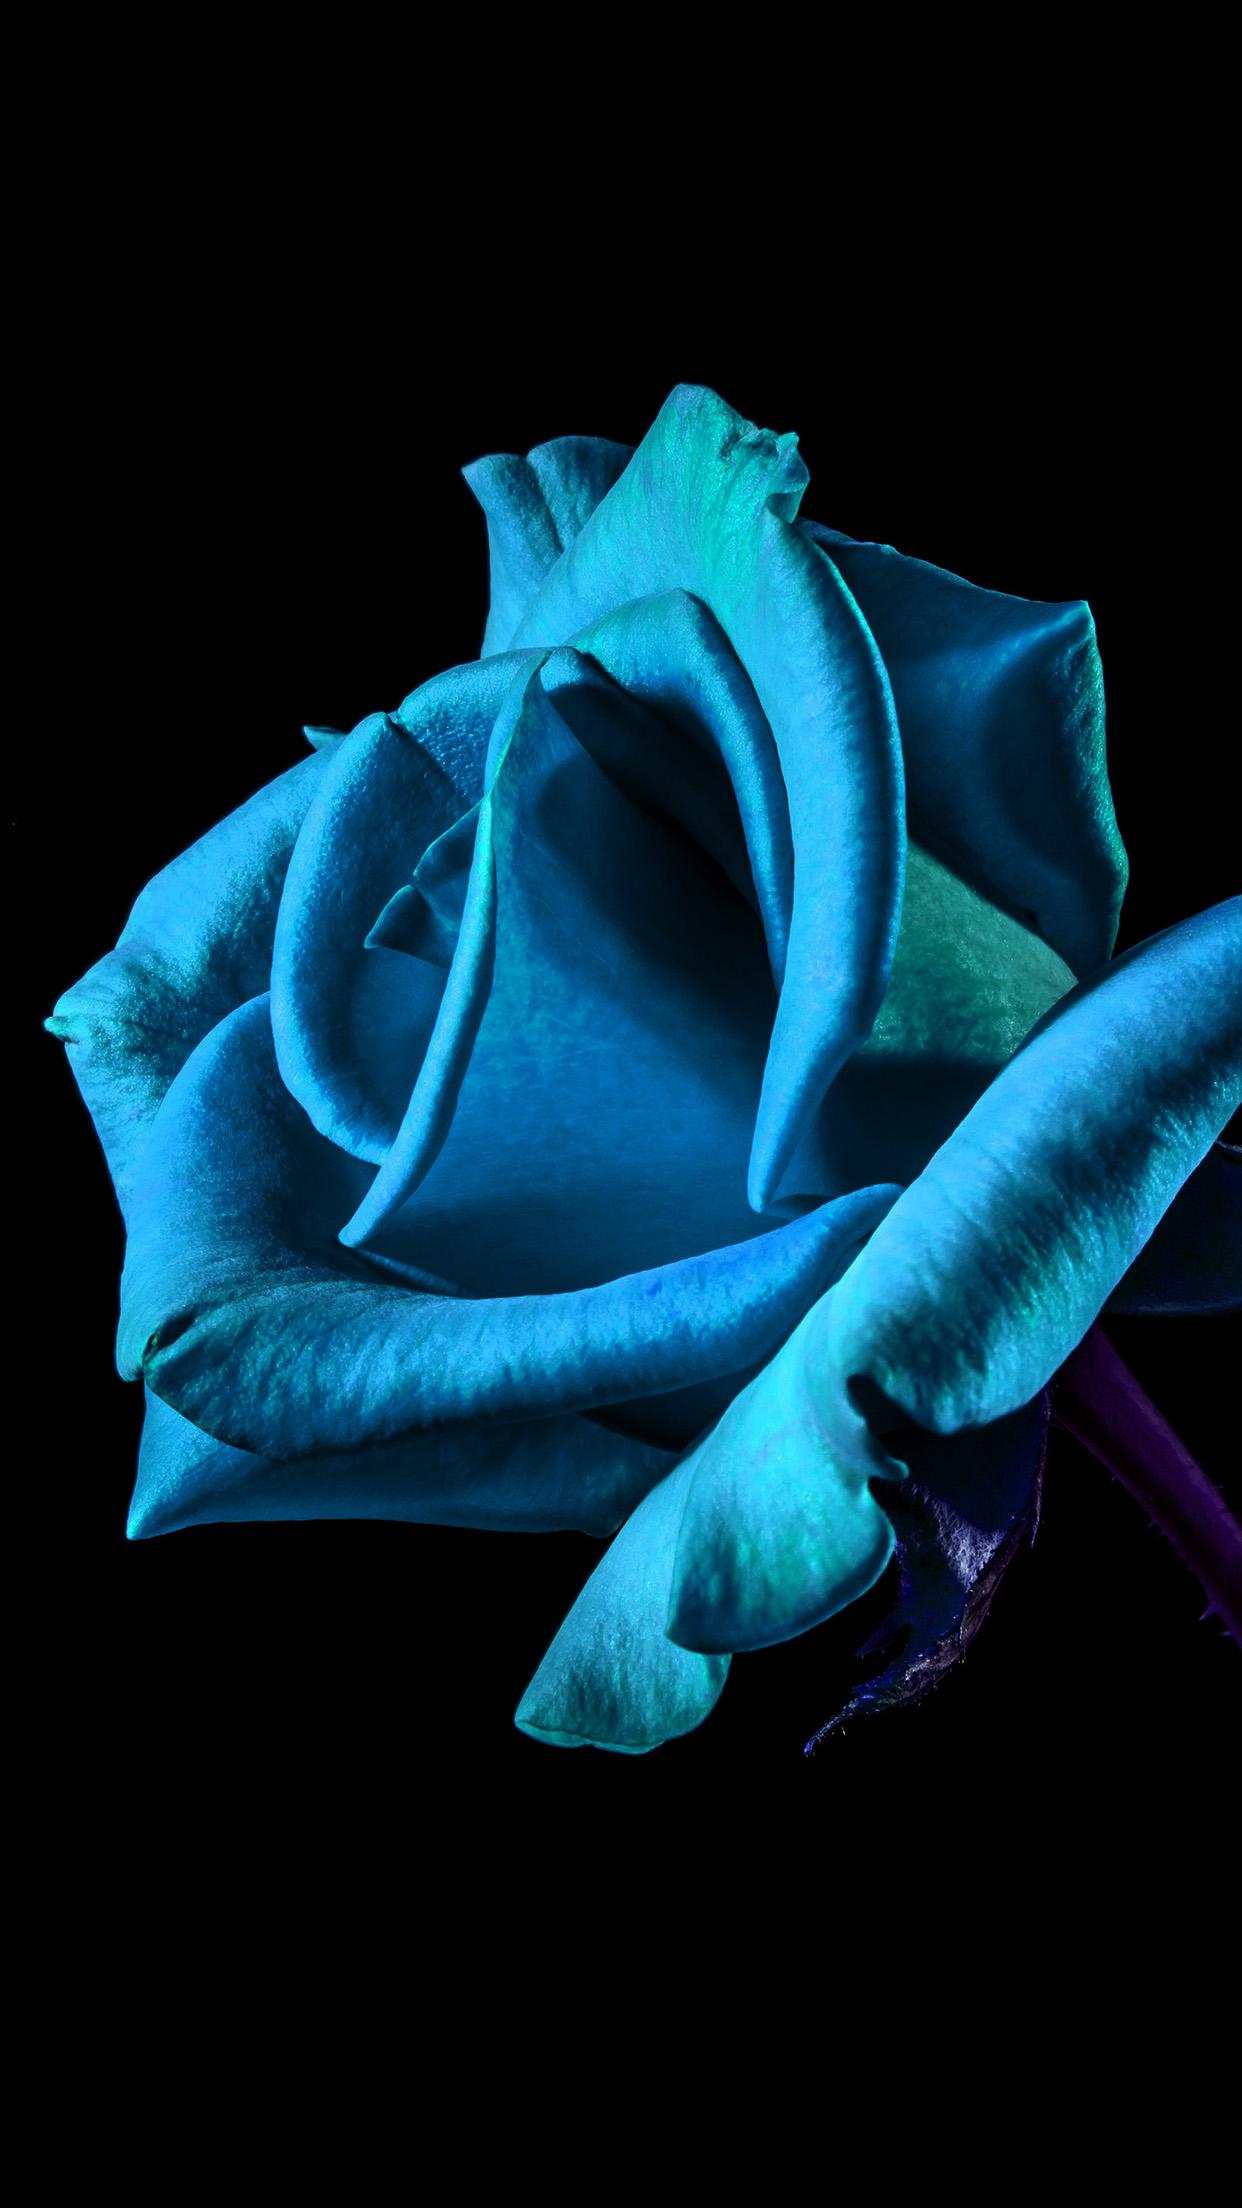 Flower Rose Blue Dark Beautiful Best Nature Android Wallpaper